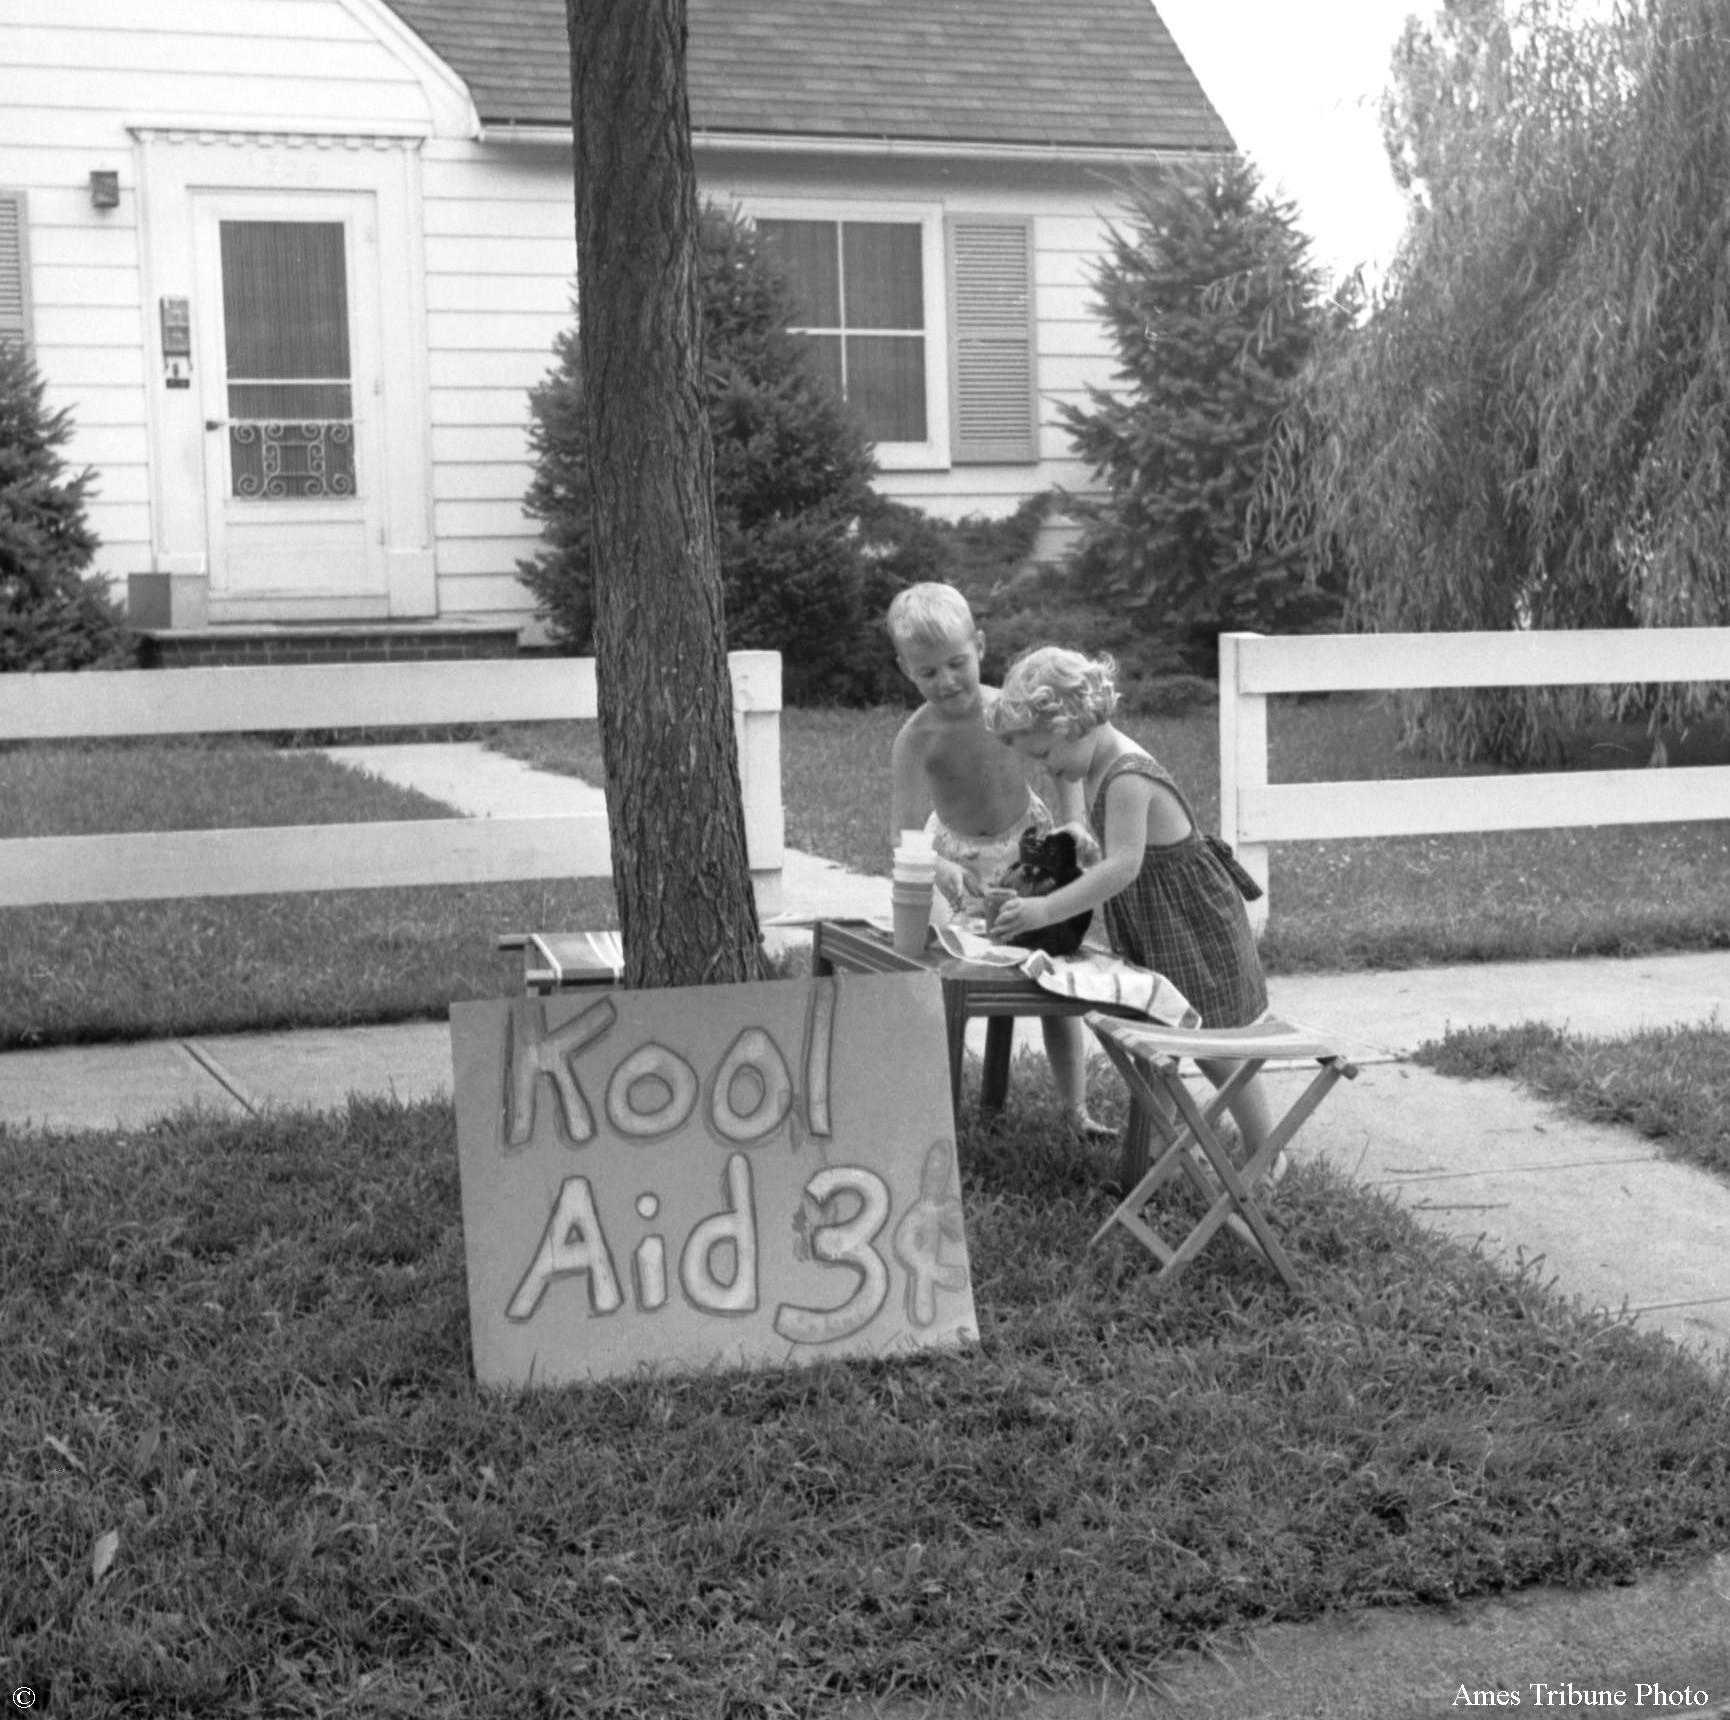 Kool Aid And Lemonade Stands Ames History Museum